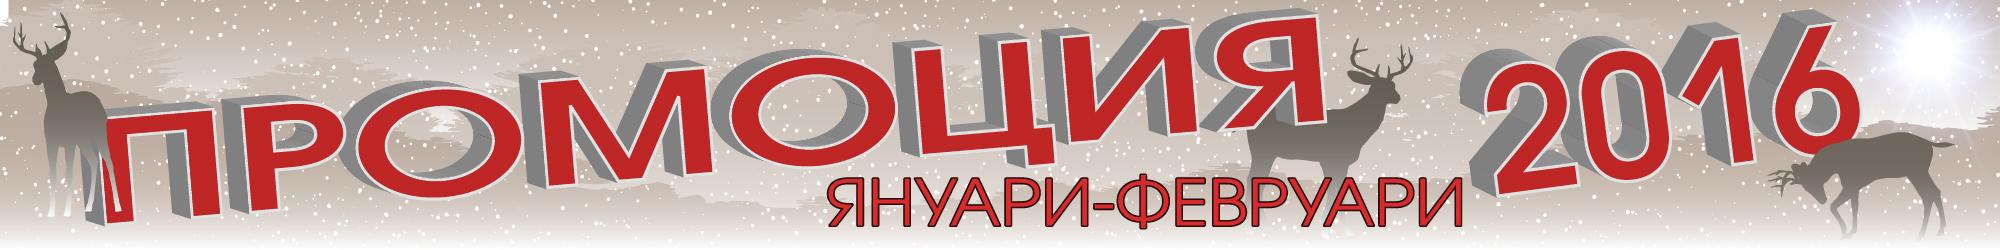 МЕСЕЧНА ПРОМОЦИЯ: ЯНУАРИ-ФЕВРУАРИ 2016